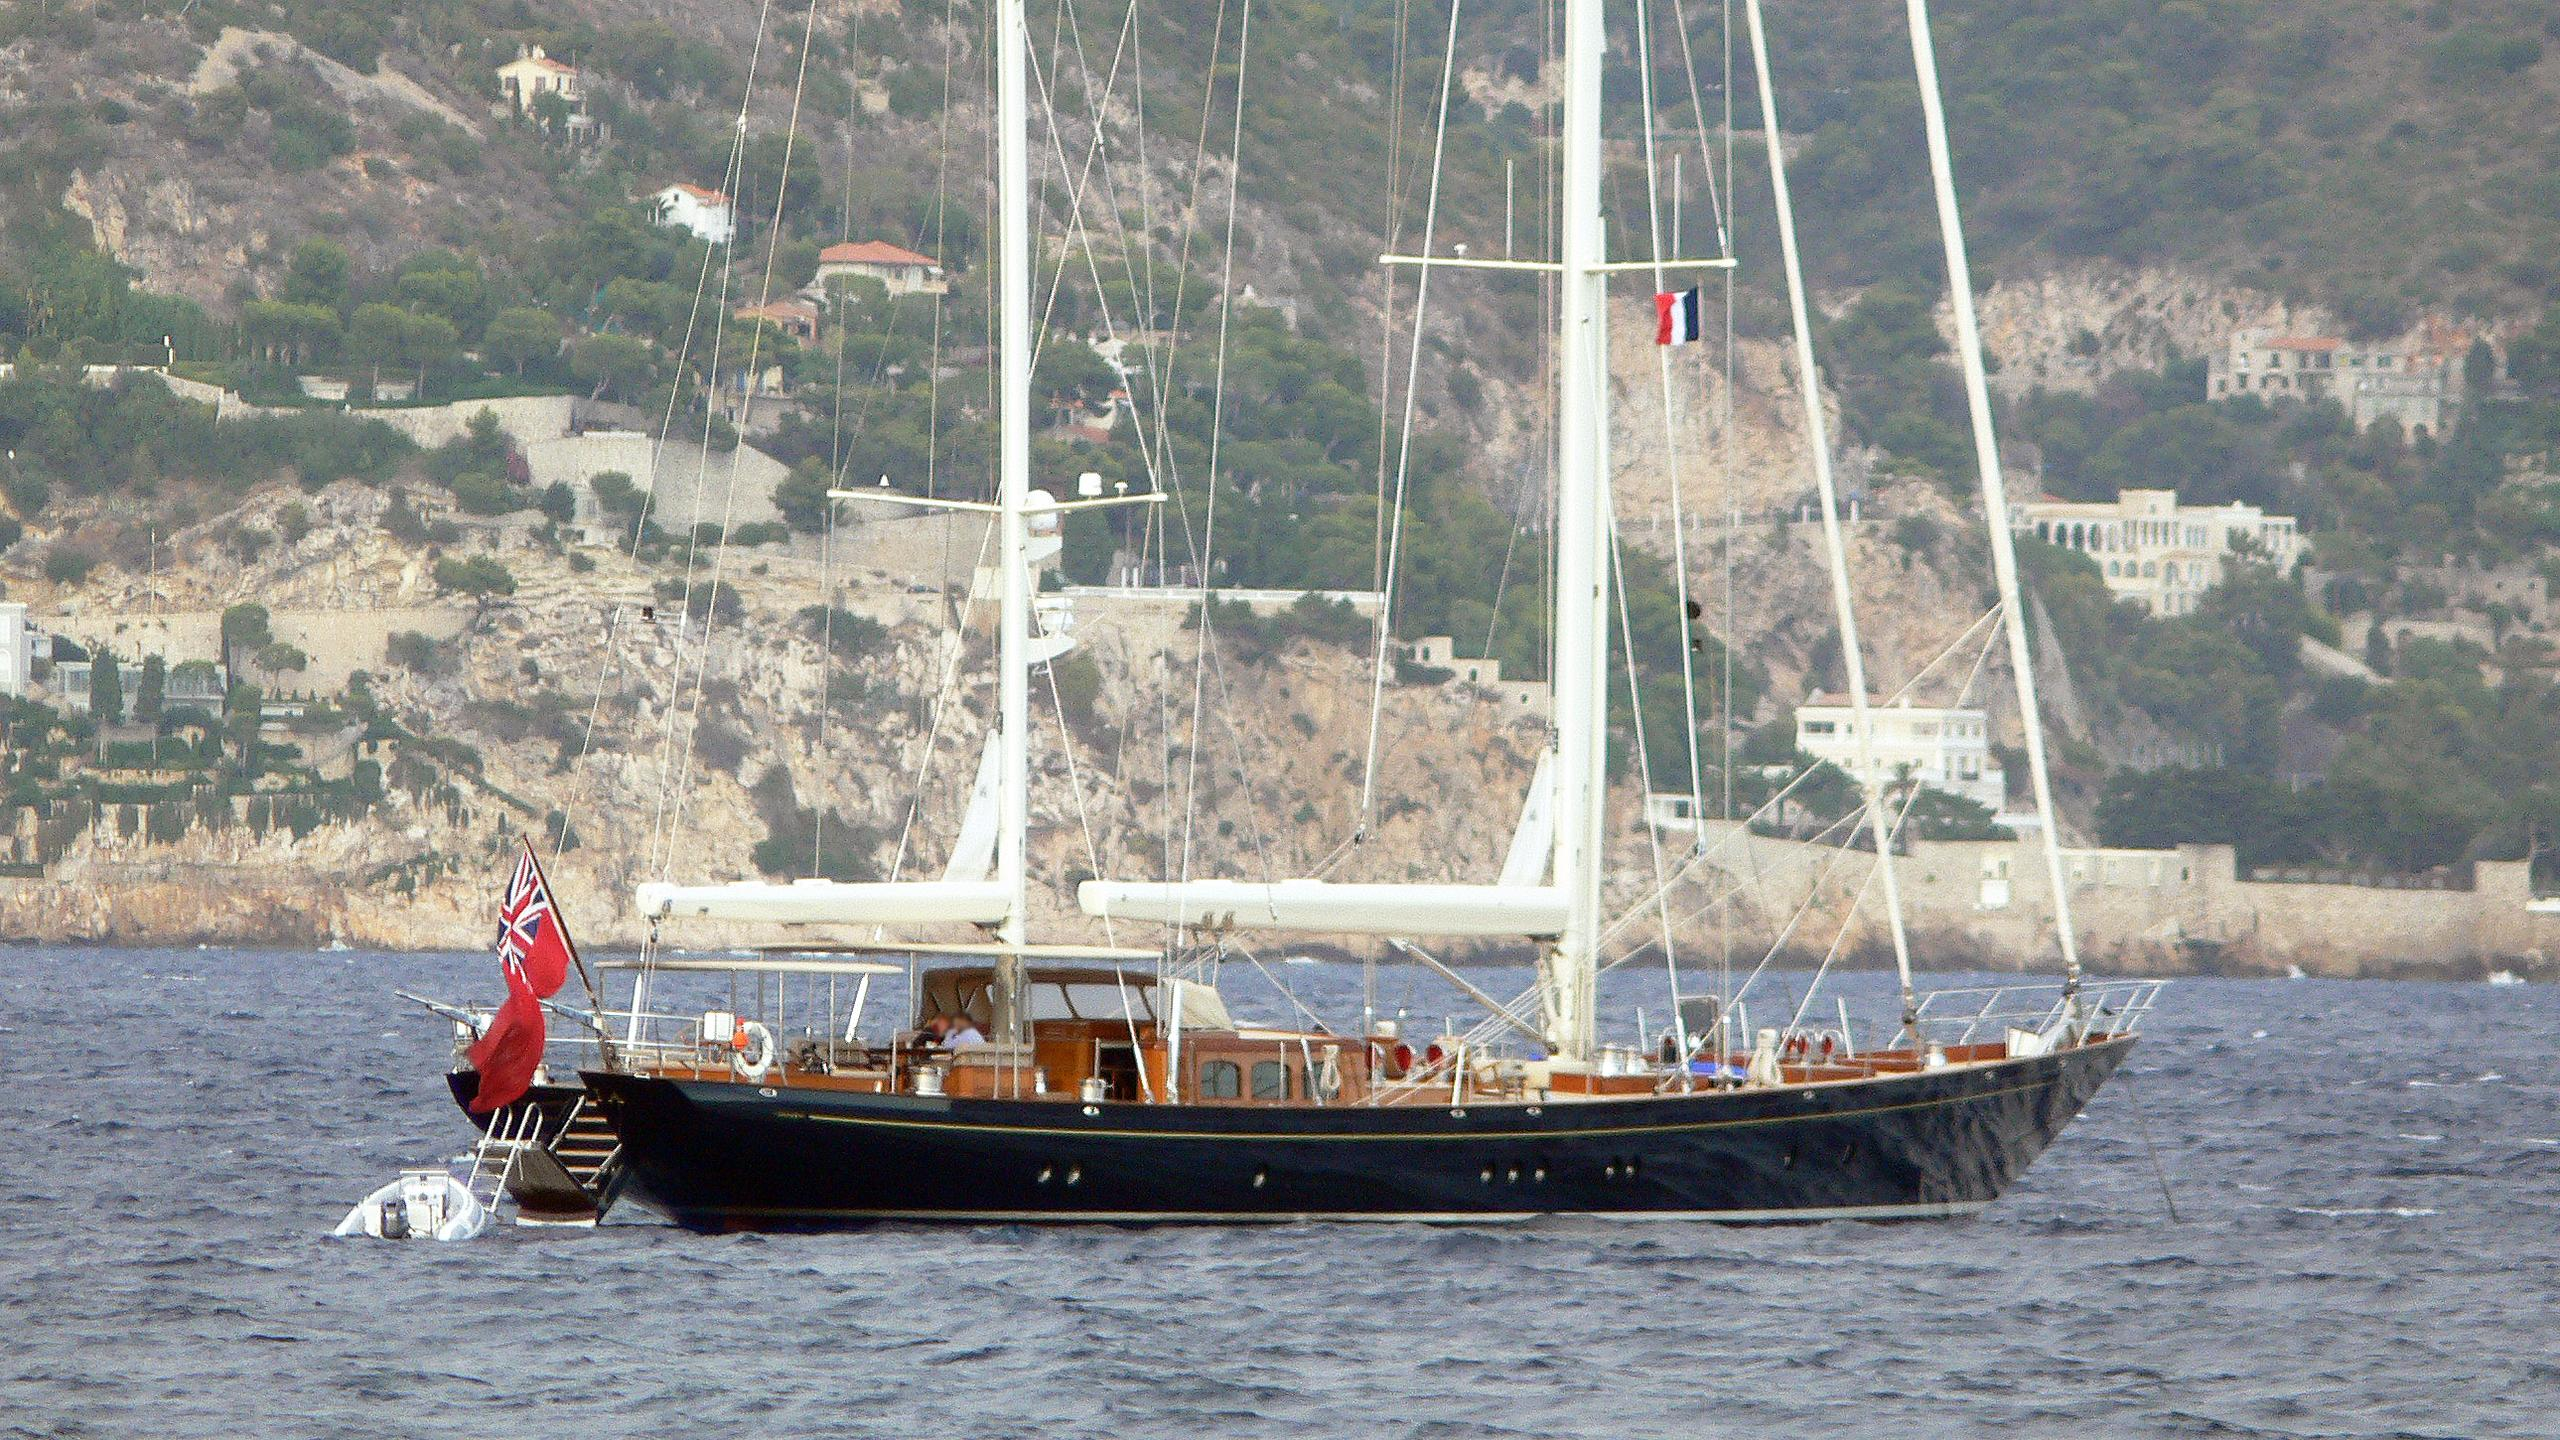 huckleberry-sailing-yacht-alloy-2001-40m-stern